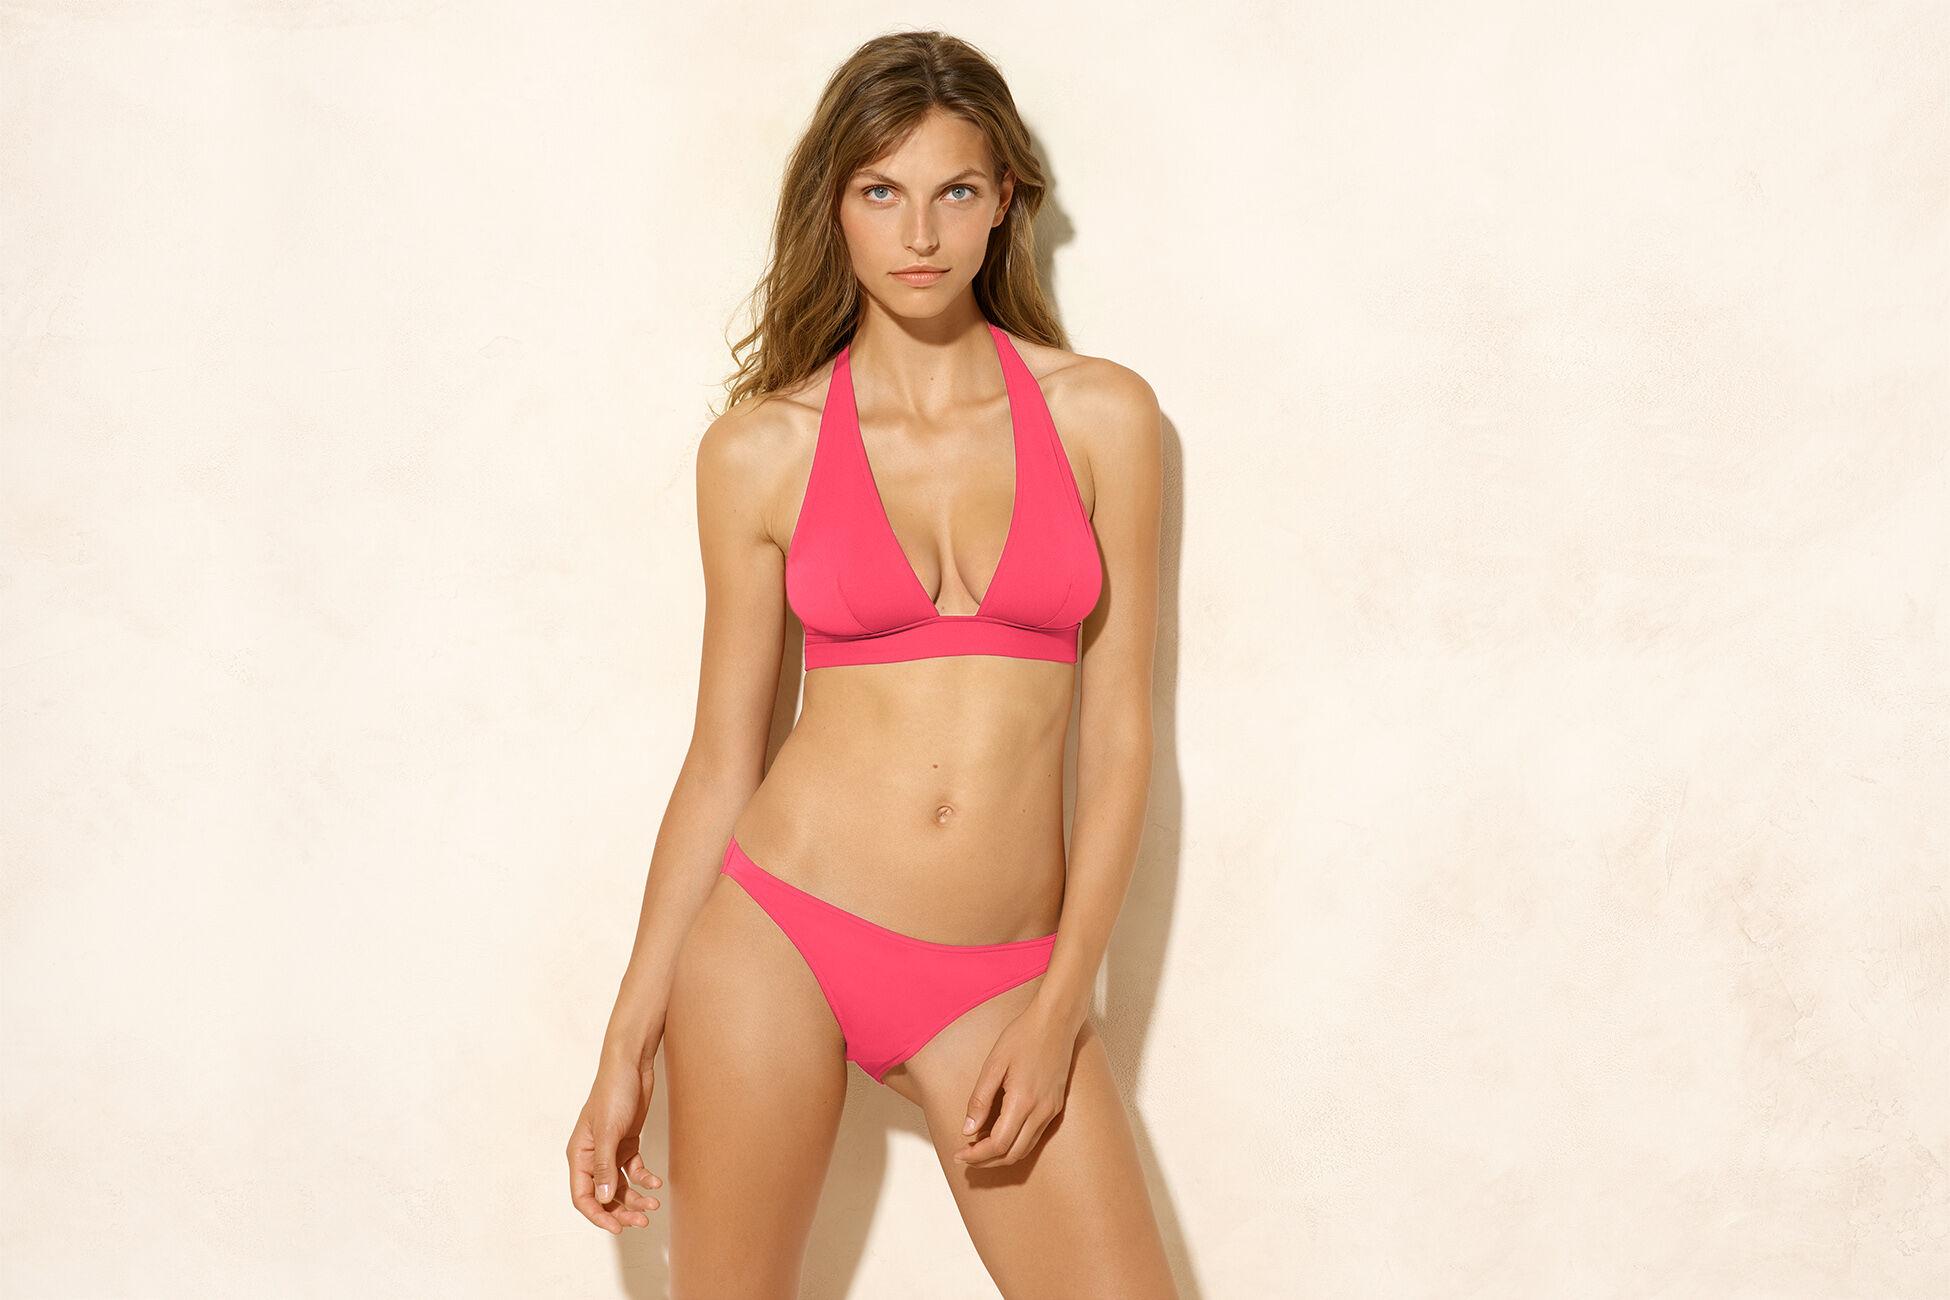 Foulard Full-cup triangle bikini top standard view �